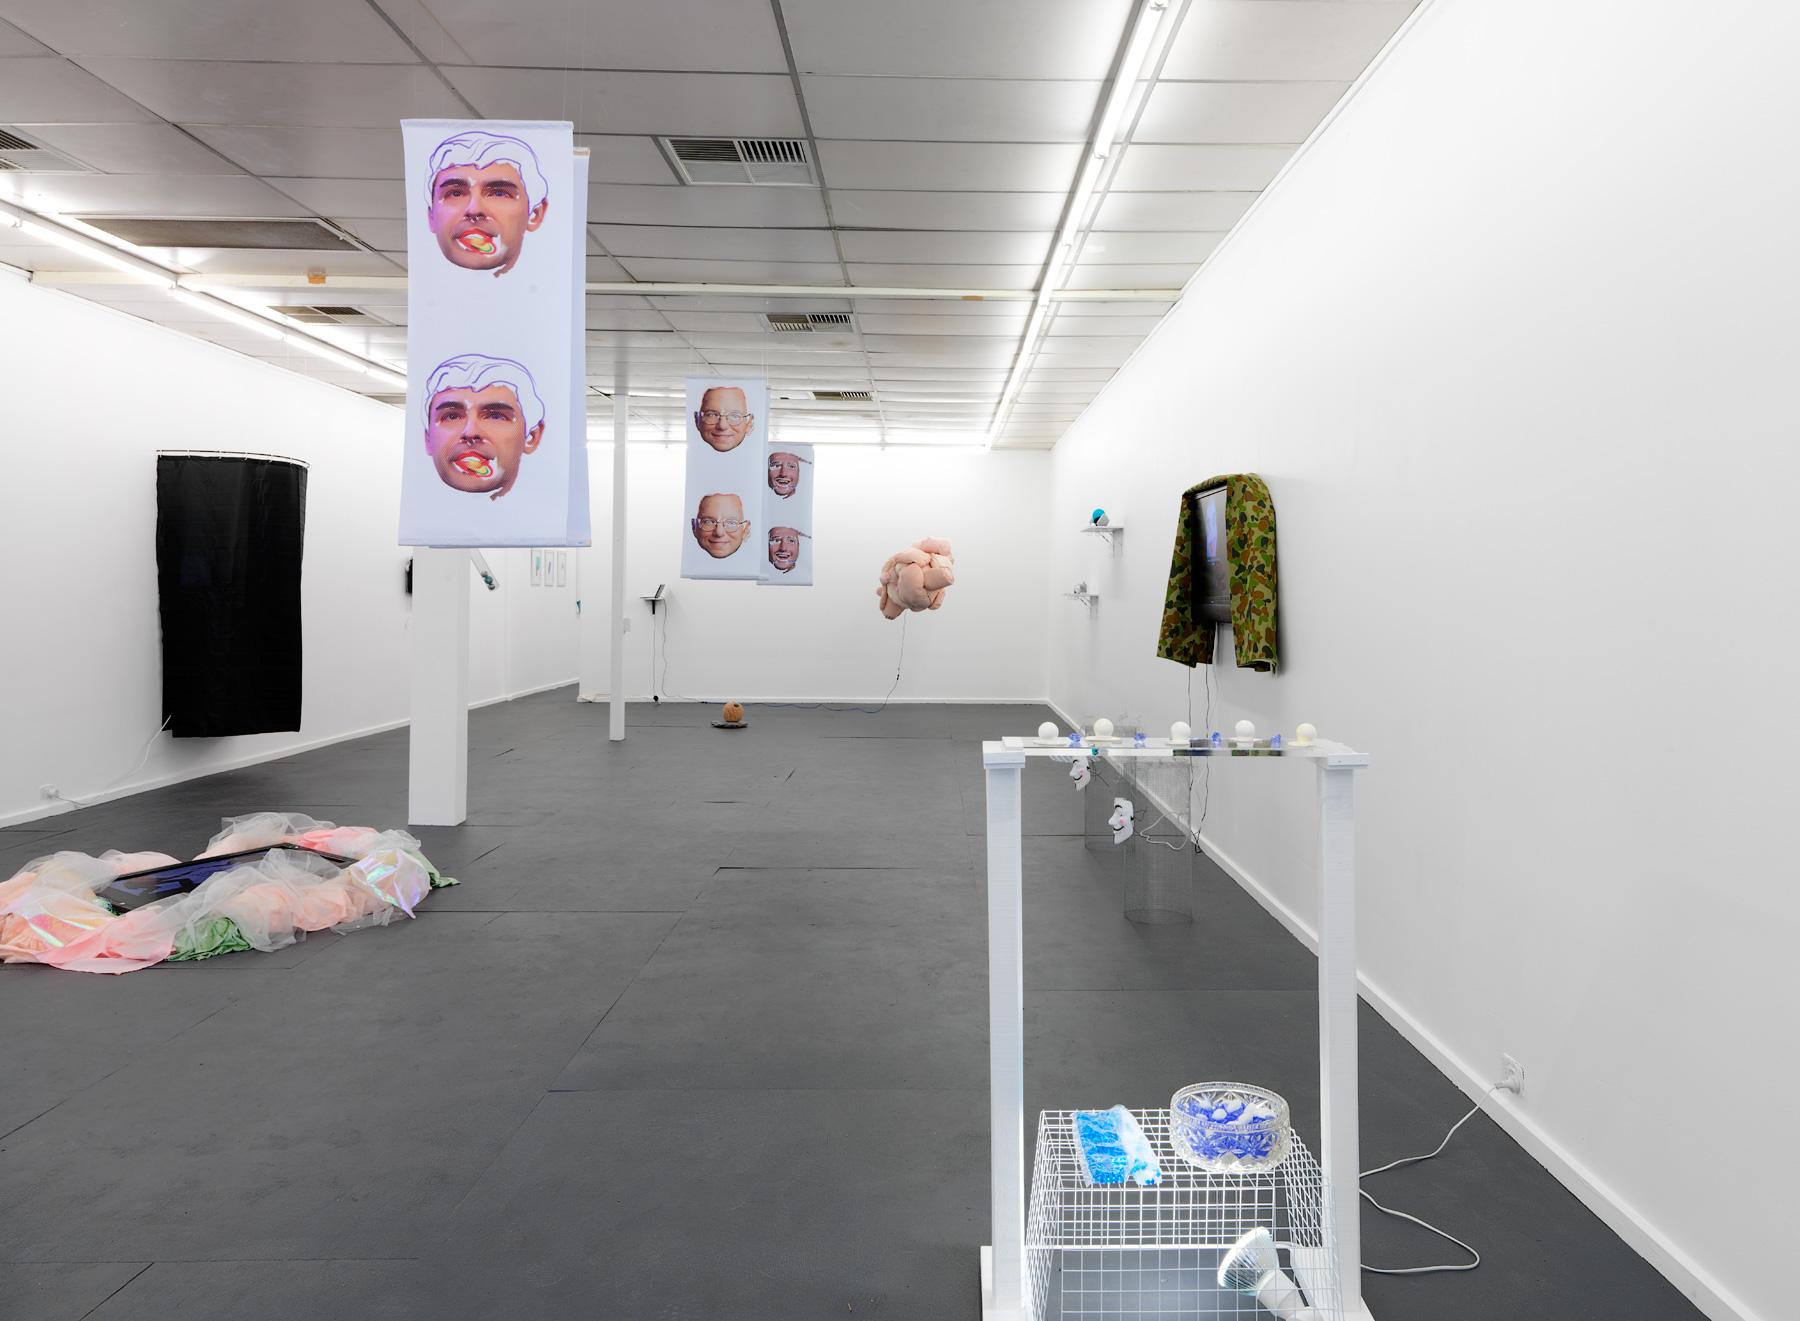 Alterior Motive , Mia van den Bos and Ashleigh D'Antonio, installation view, Fontanelle Gallery, Adelaide 2016. Photography by Grant Hancock.